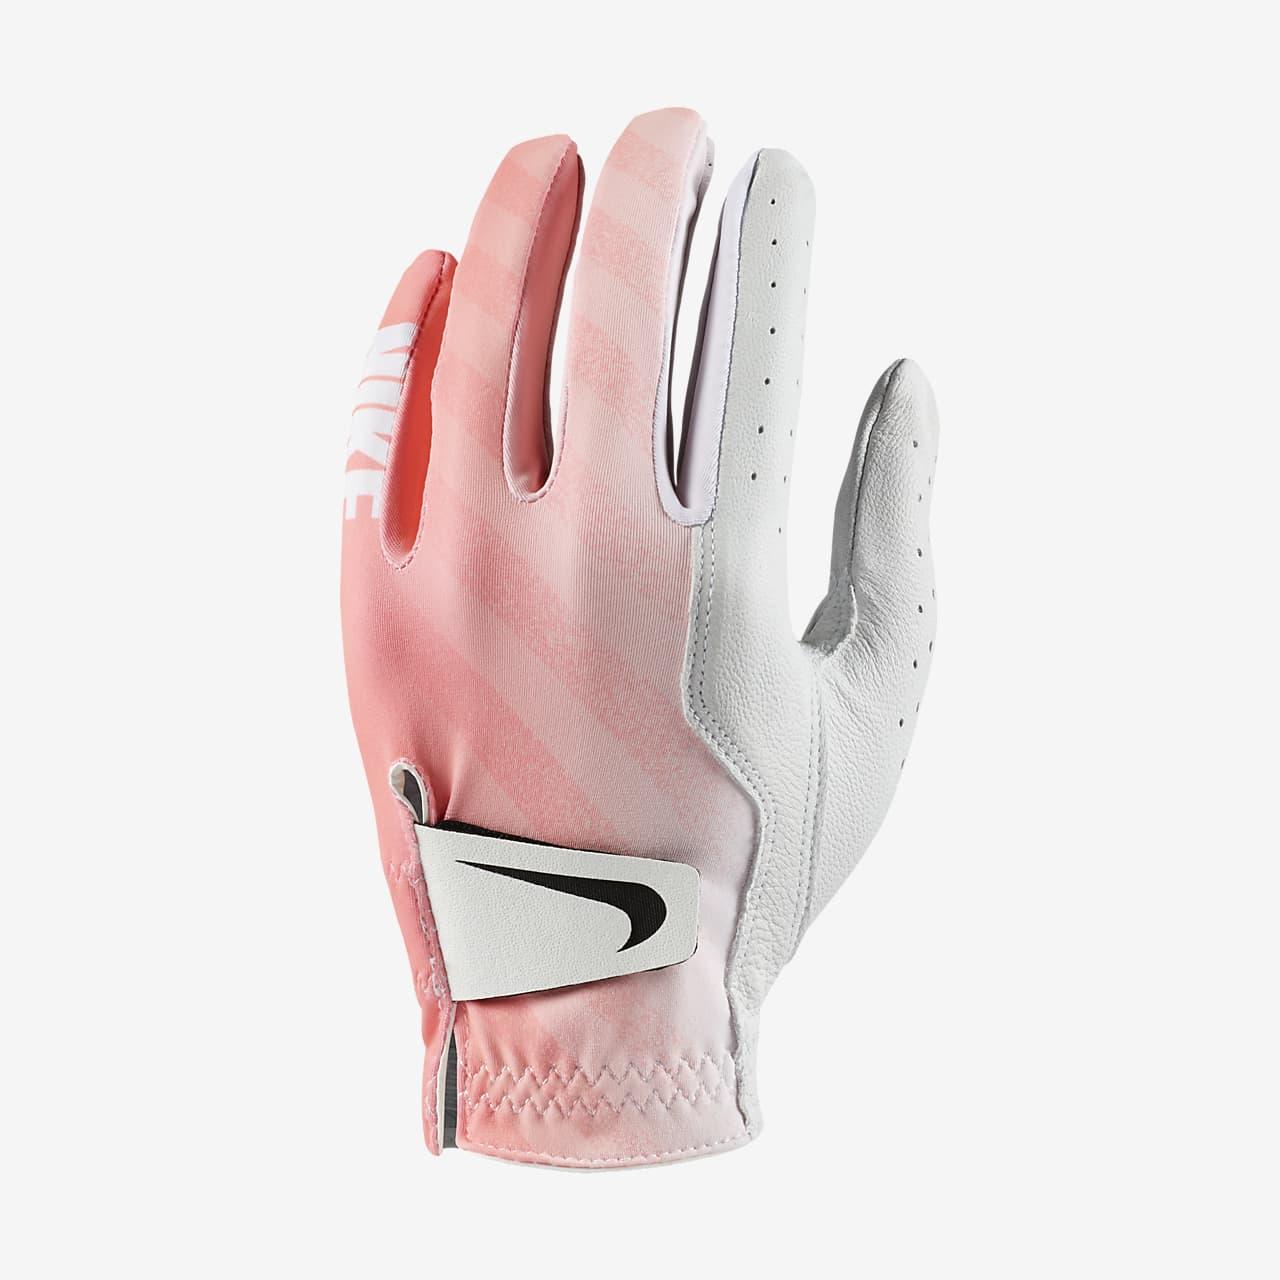 Guante de golf para mujer Nike Tech (izquierdo, talla normal)